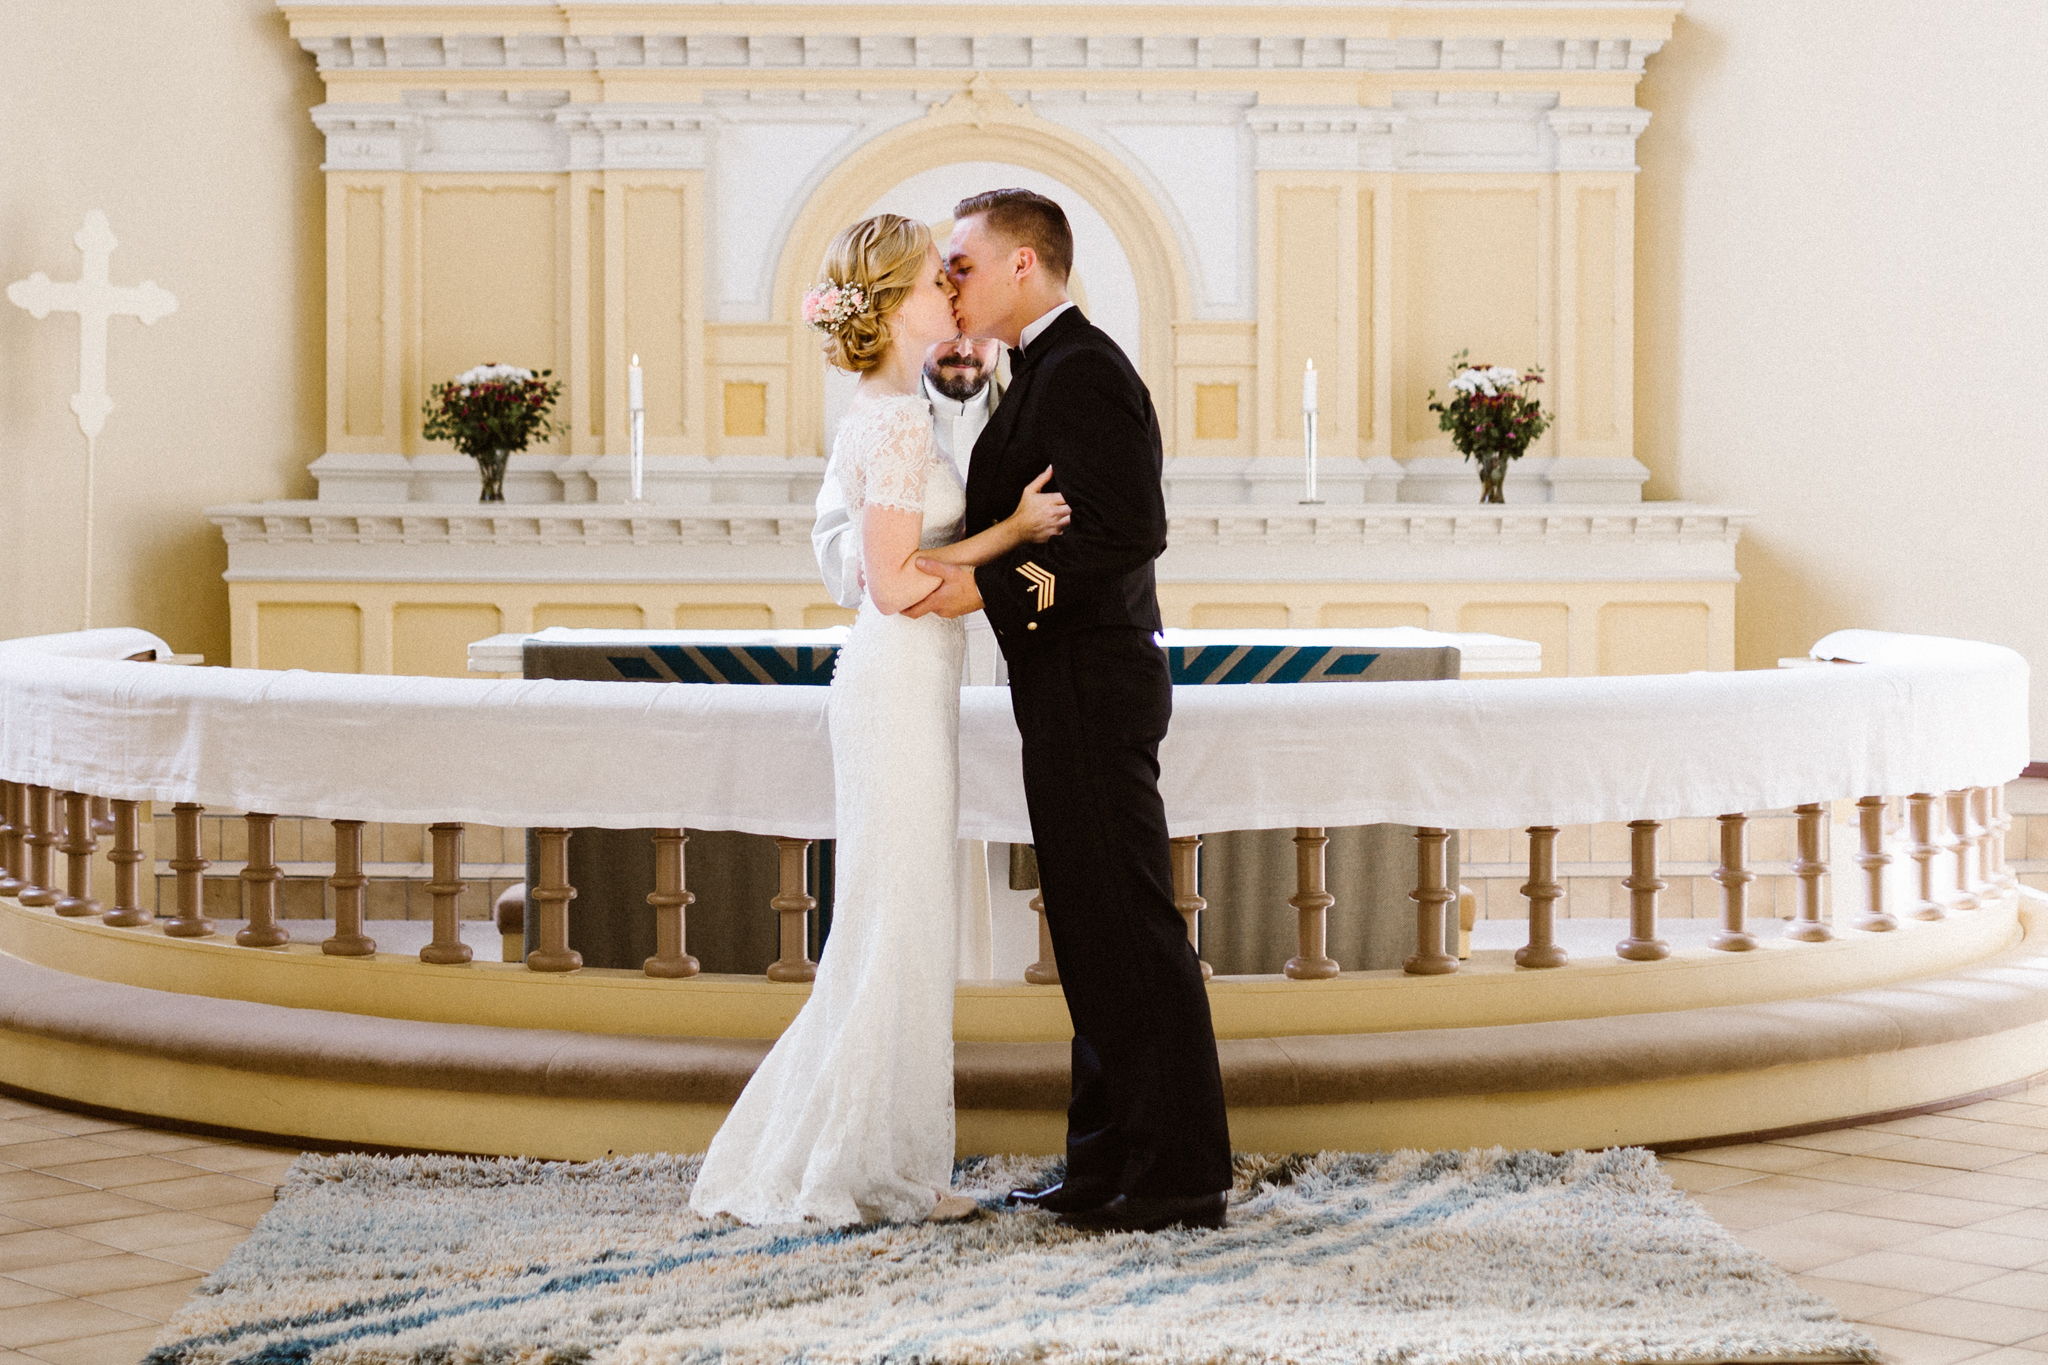 Pinja + Marko -- Patrick Karkkolainen Wedding Photographer-58.jpg